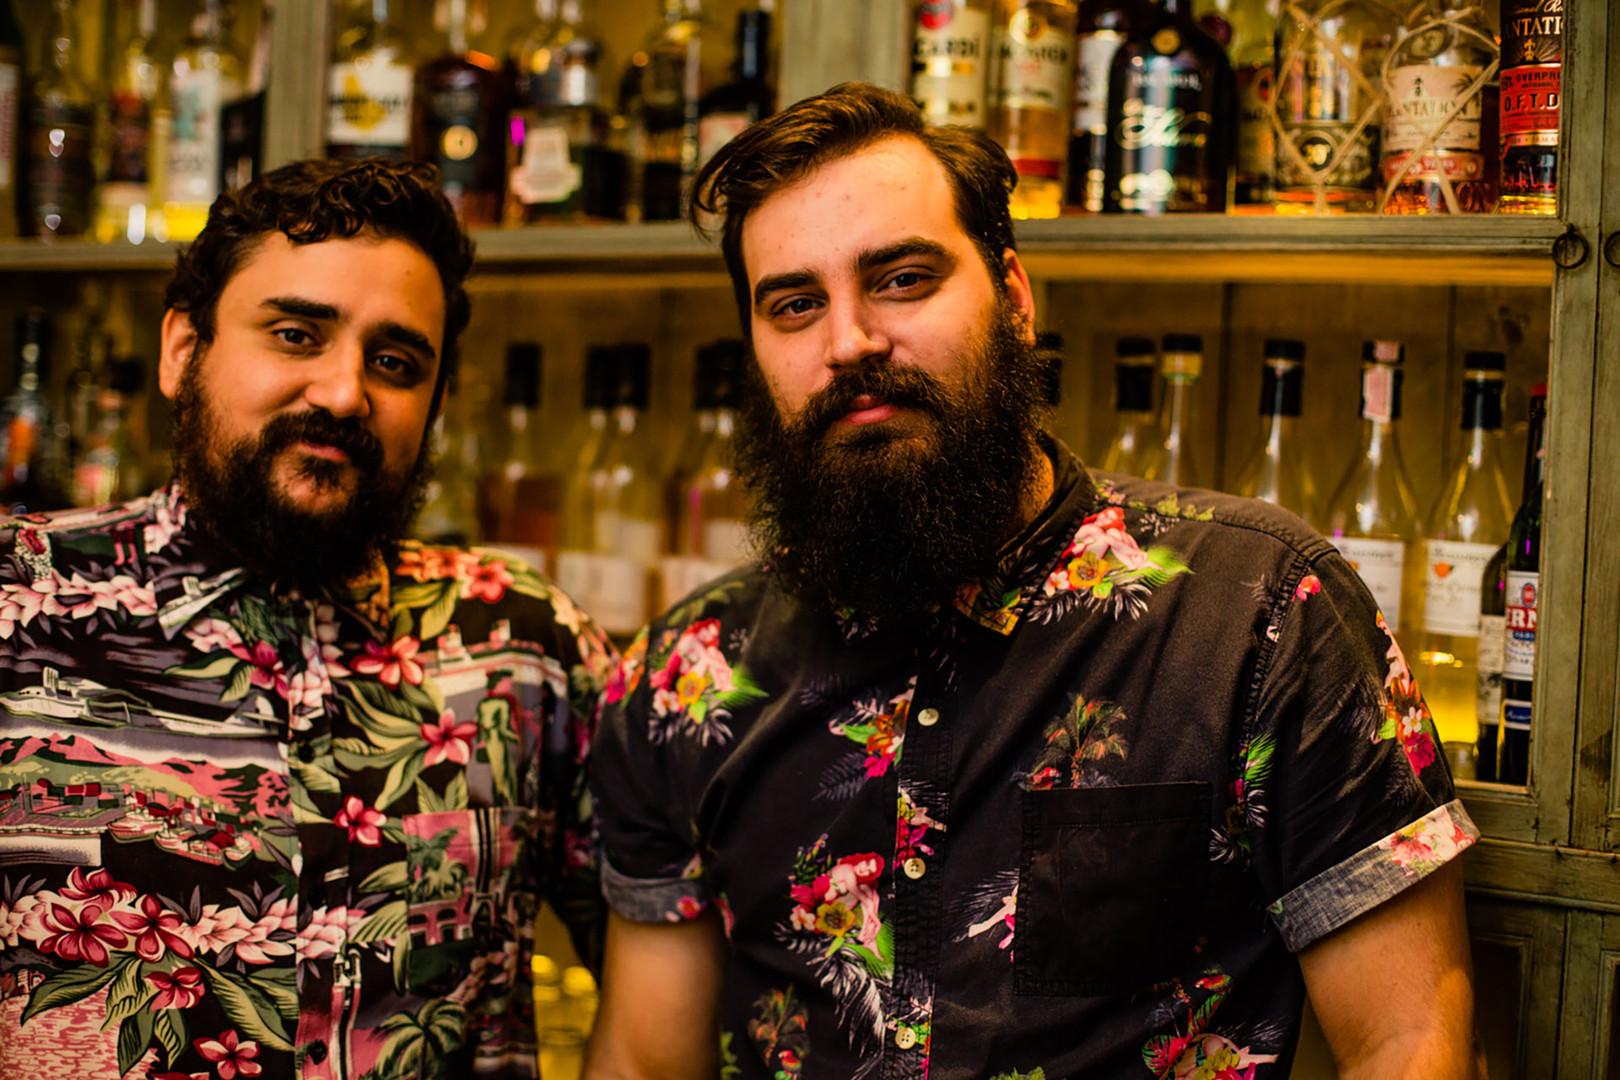 Tropic City Founders Sebastian De La Cruz & Philip Stefanescu